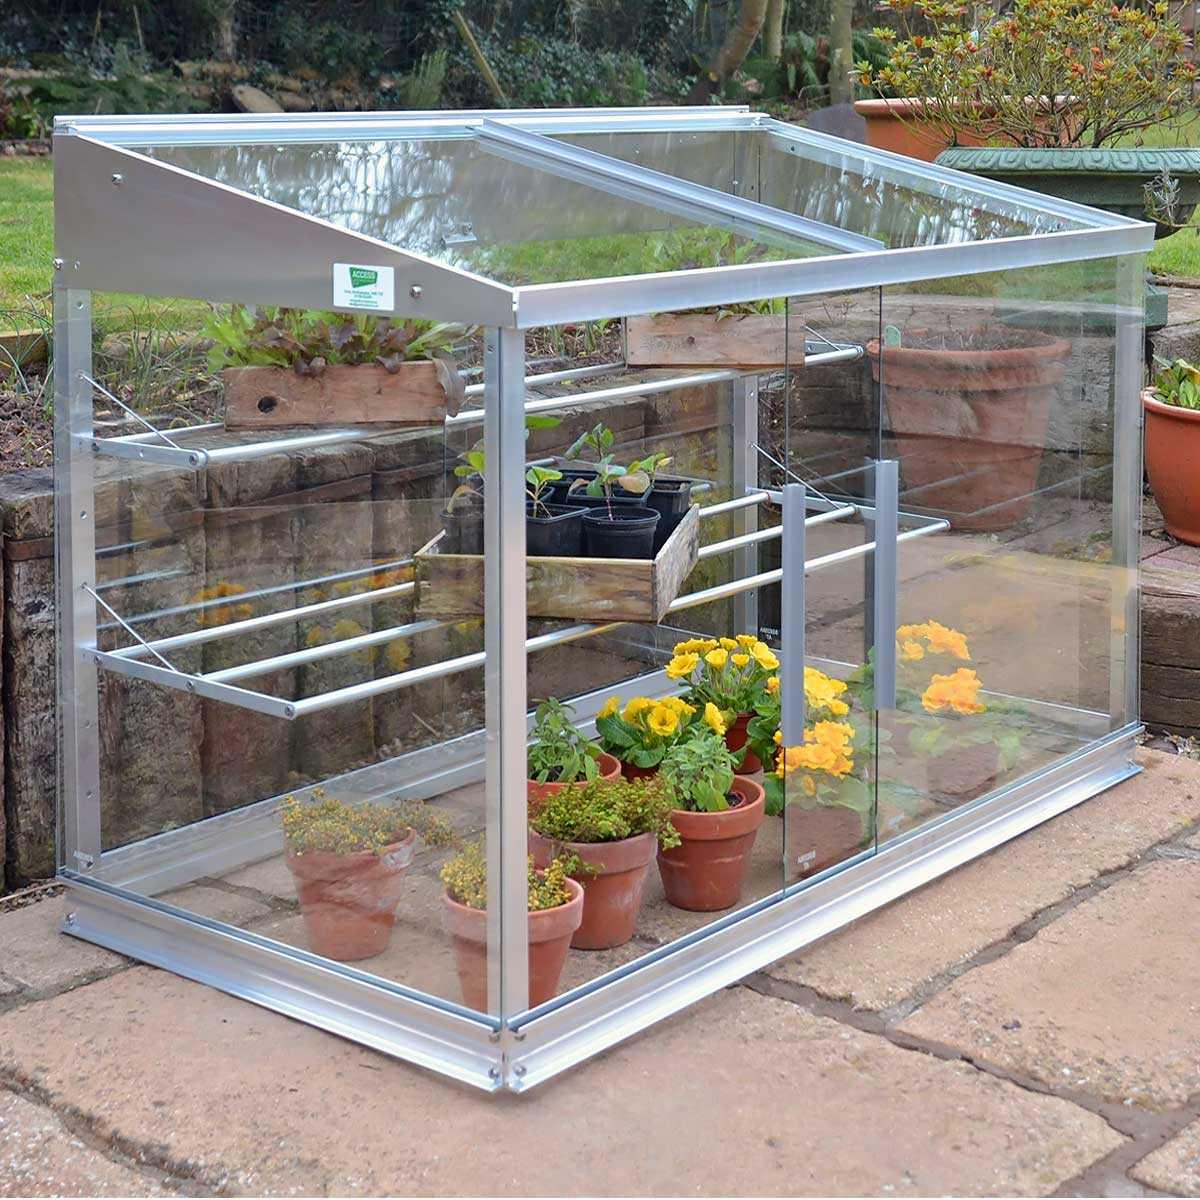 mini serre en verre et aluminium 0 80m2 vente au meilleur prix jardins animes